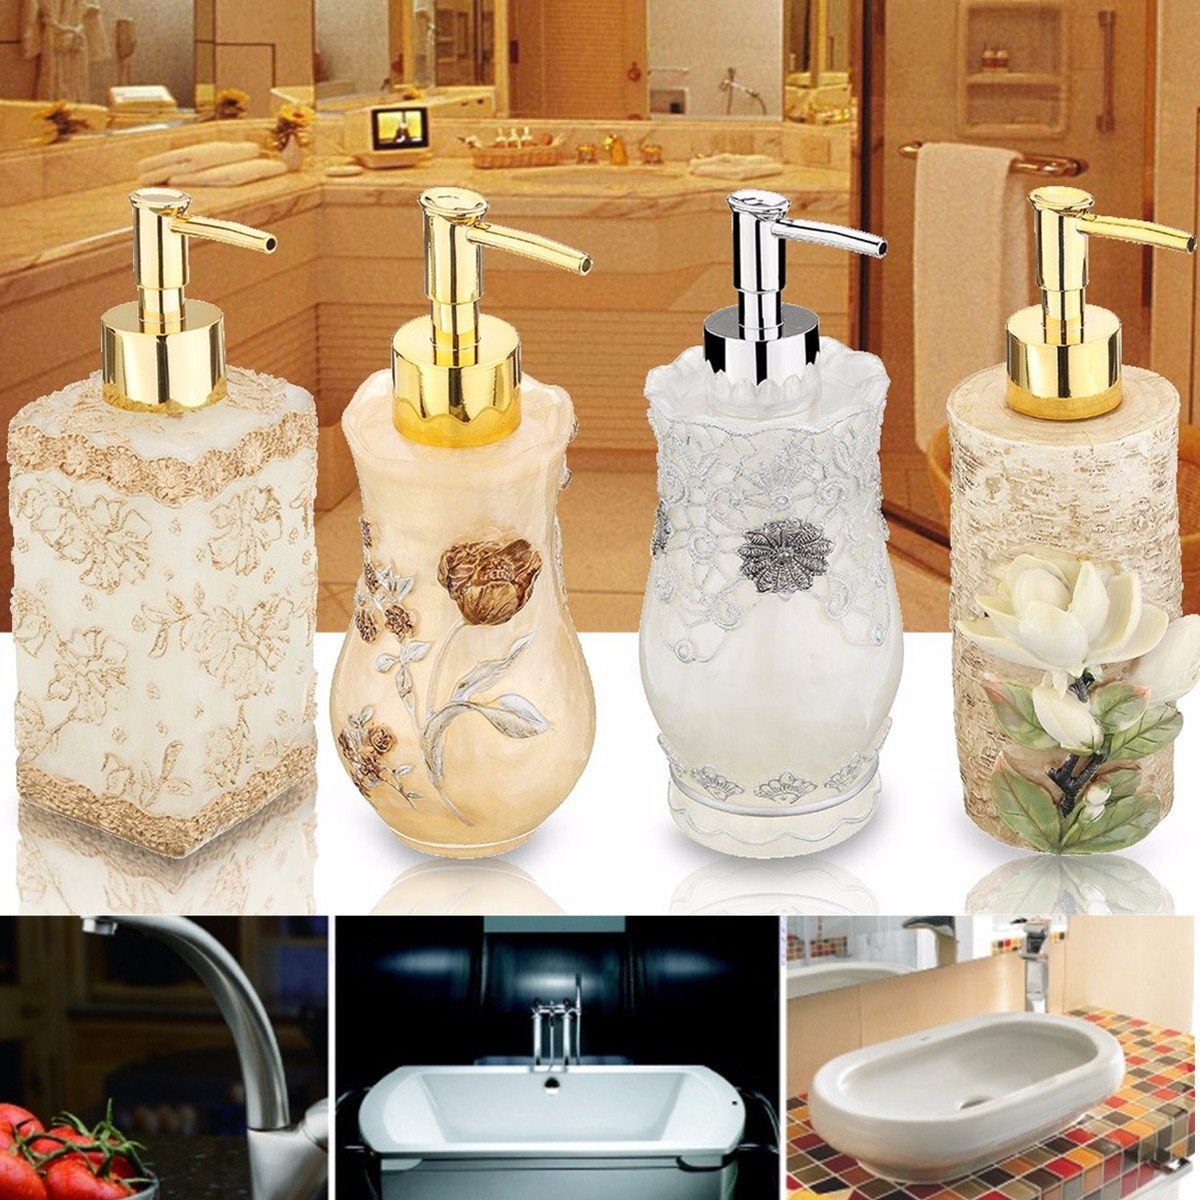 300ML Resin Liquid Hand Soap Pump Dispenser Bottle Lotion Shampoo Essential Oils Lotion Shampoo Gel Container Bathroom Sink Hand Sanitizer